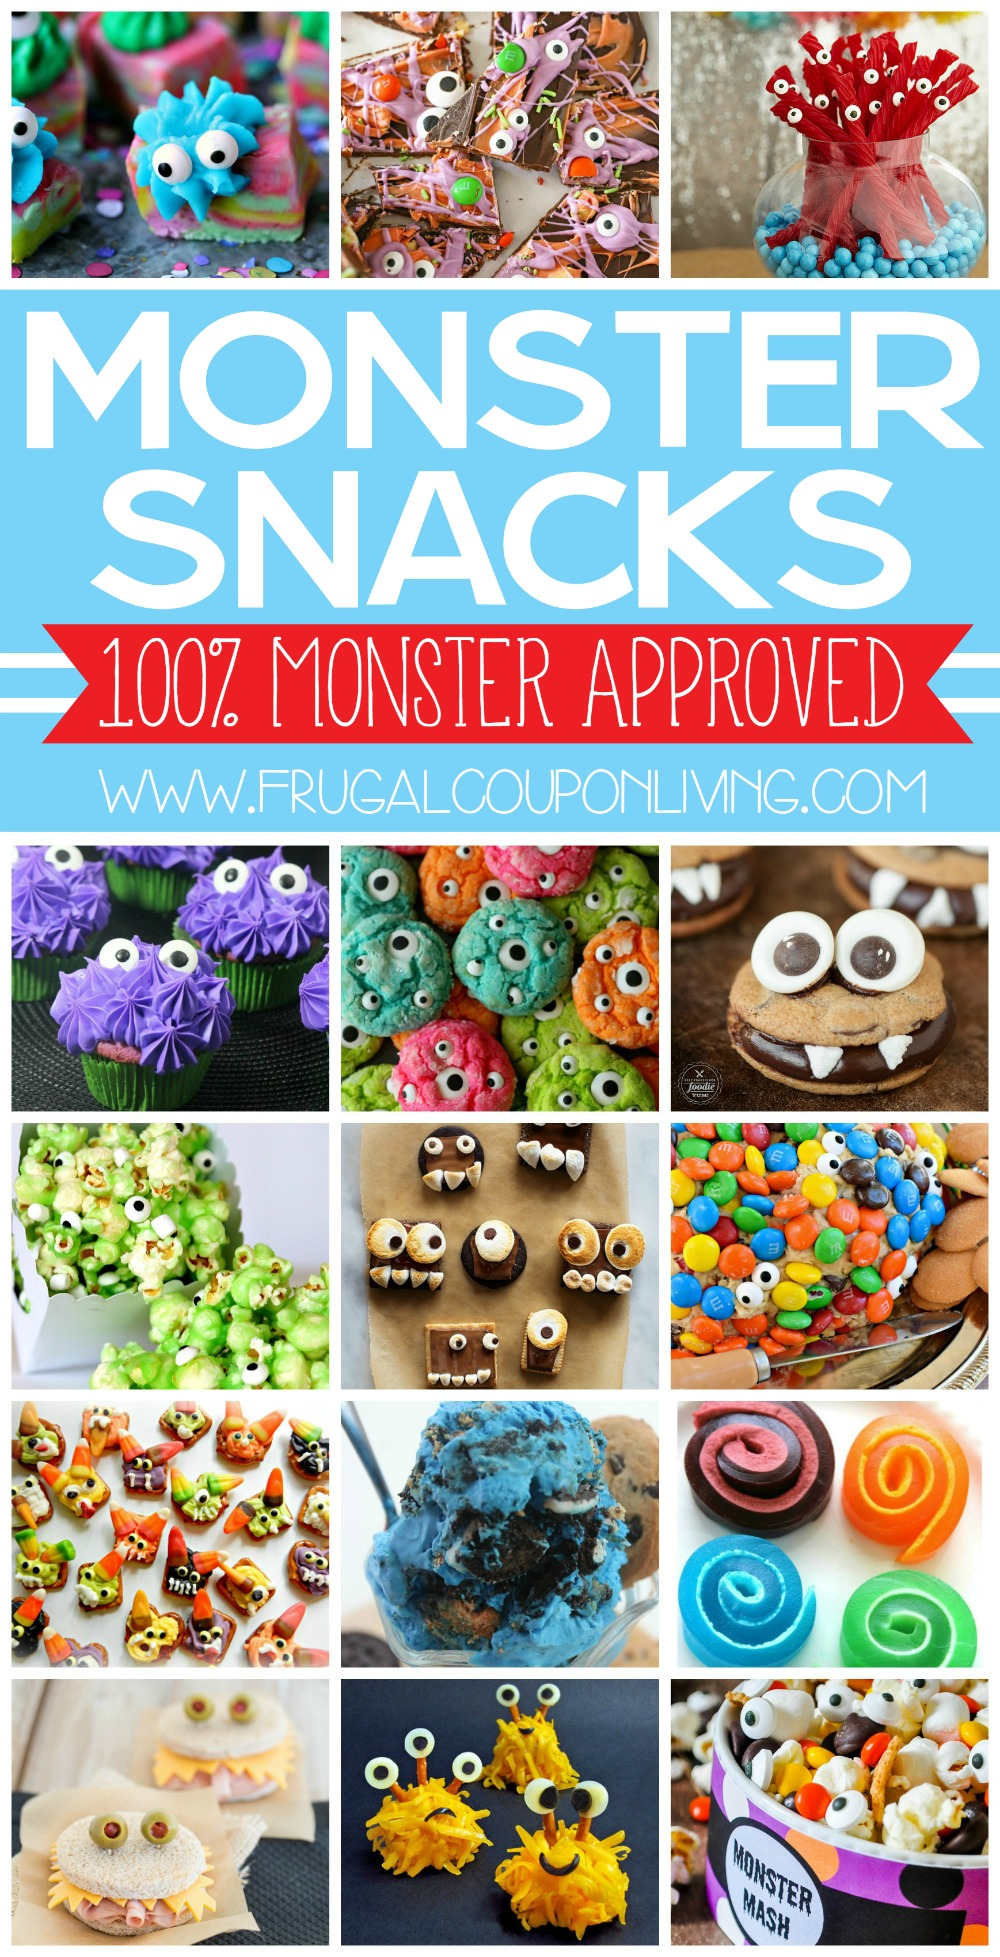 Monster-snacks-frugal-coupon-living